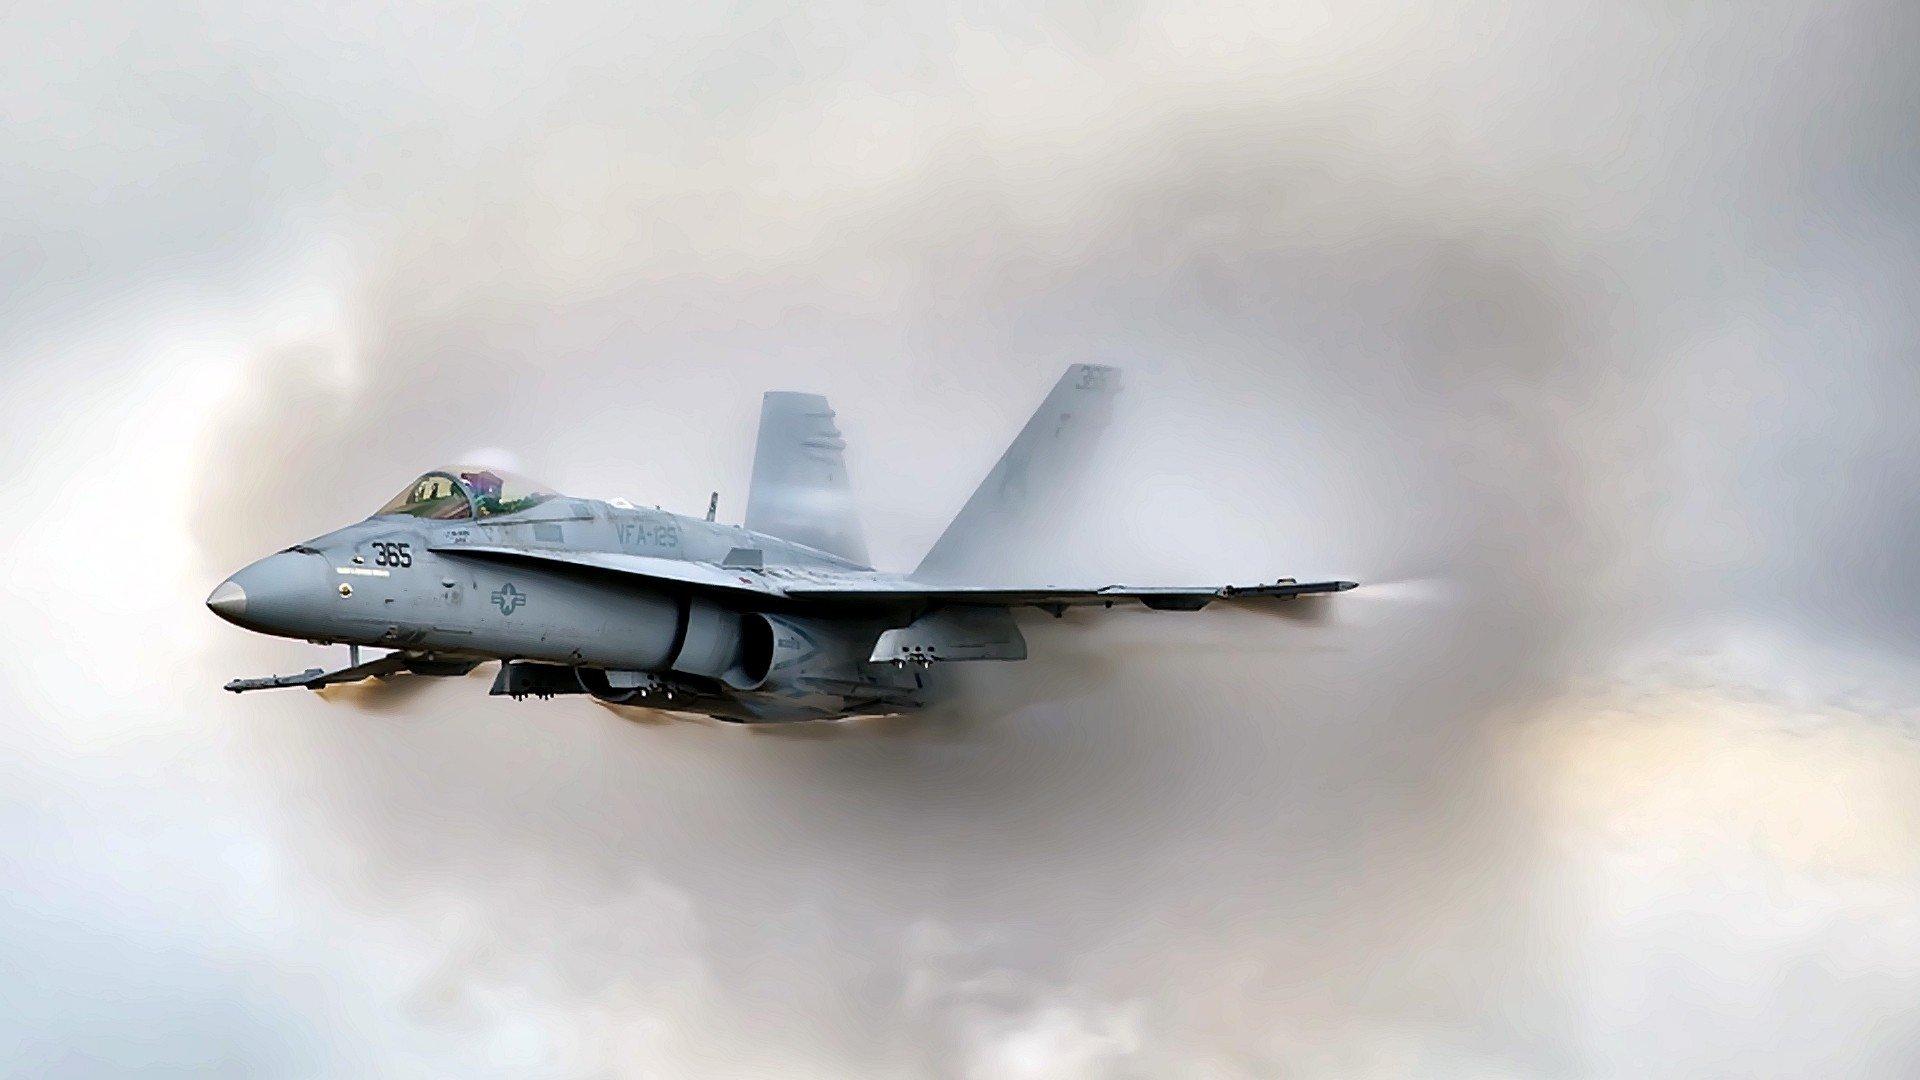 Military - McDonnell Douglas F/A-18 Hornet  Wallpaper